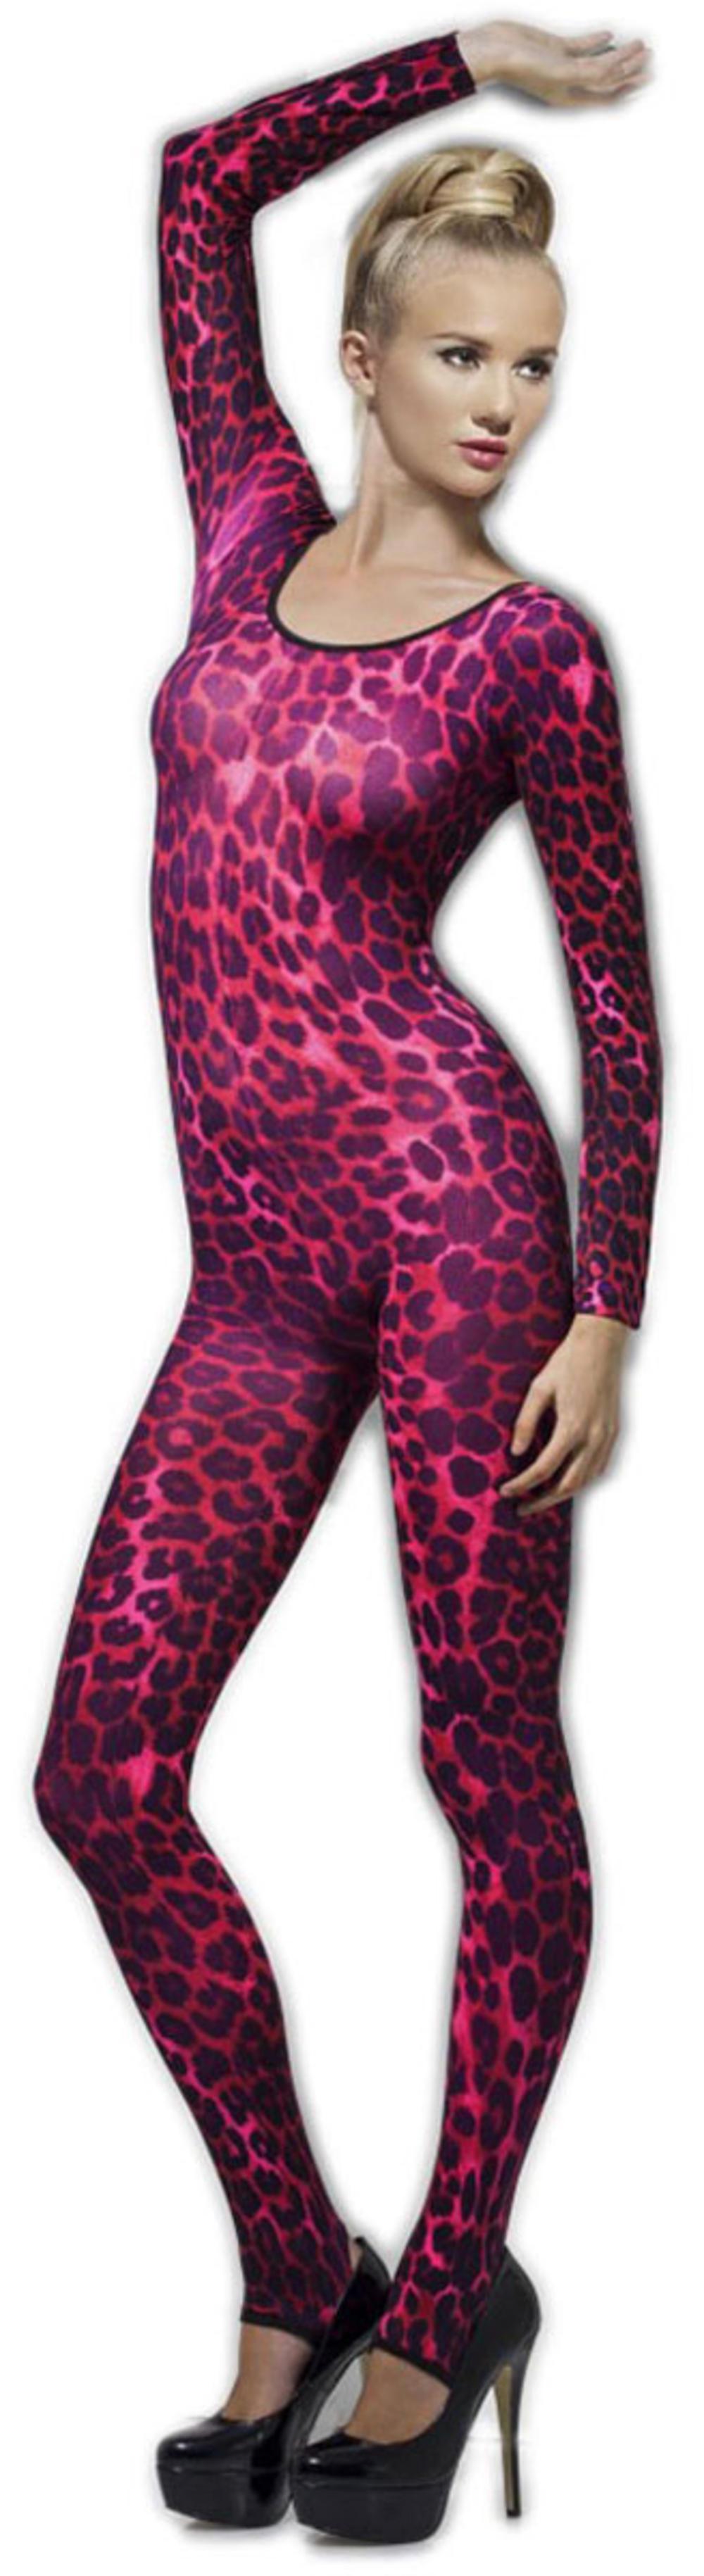 Pink Cheetah Print Bodysuit Costume